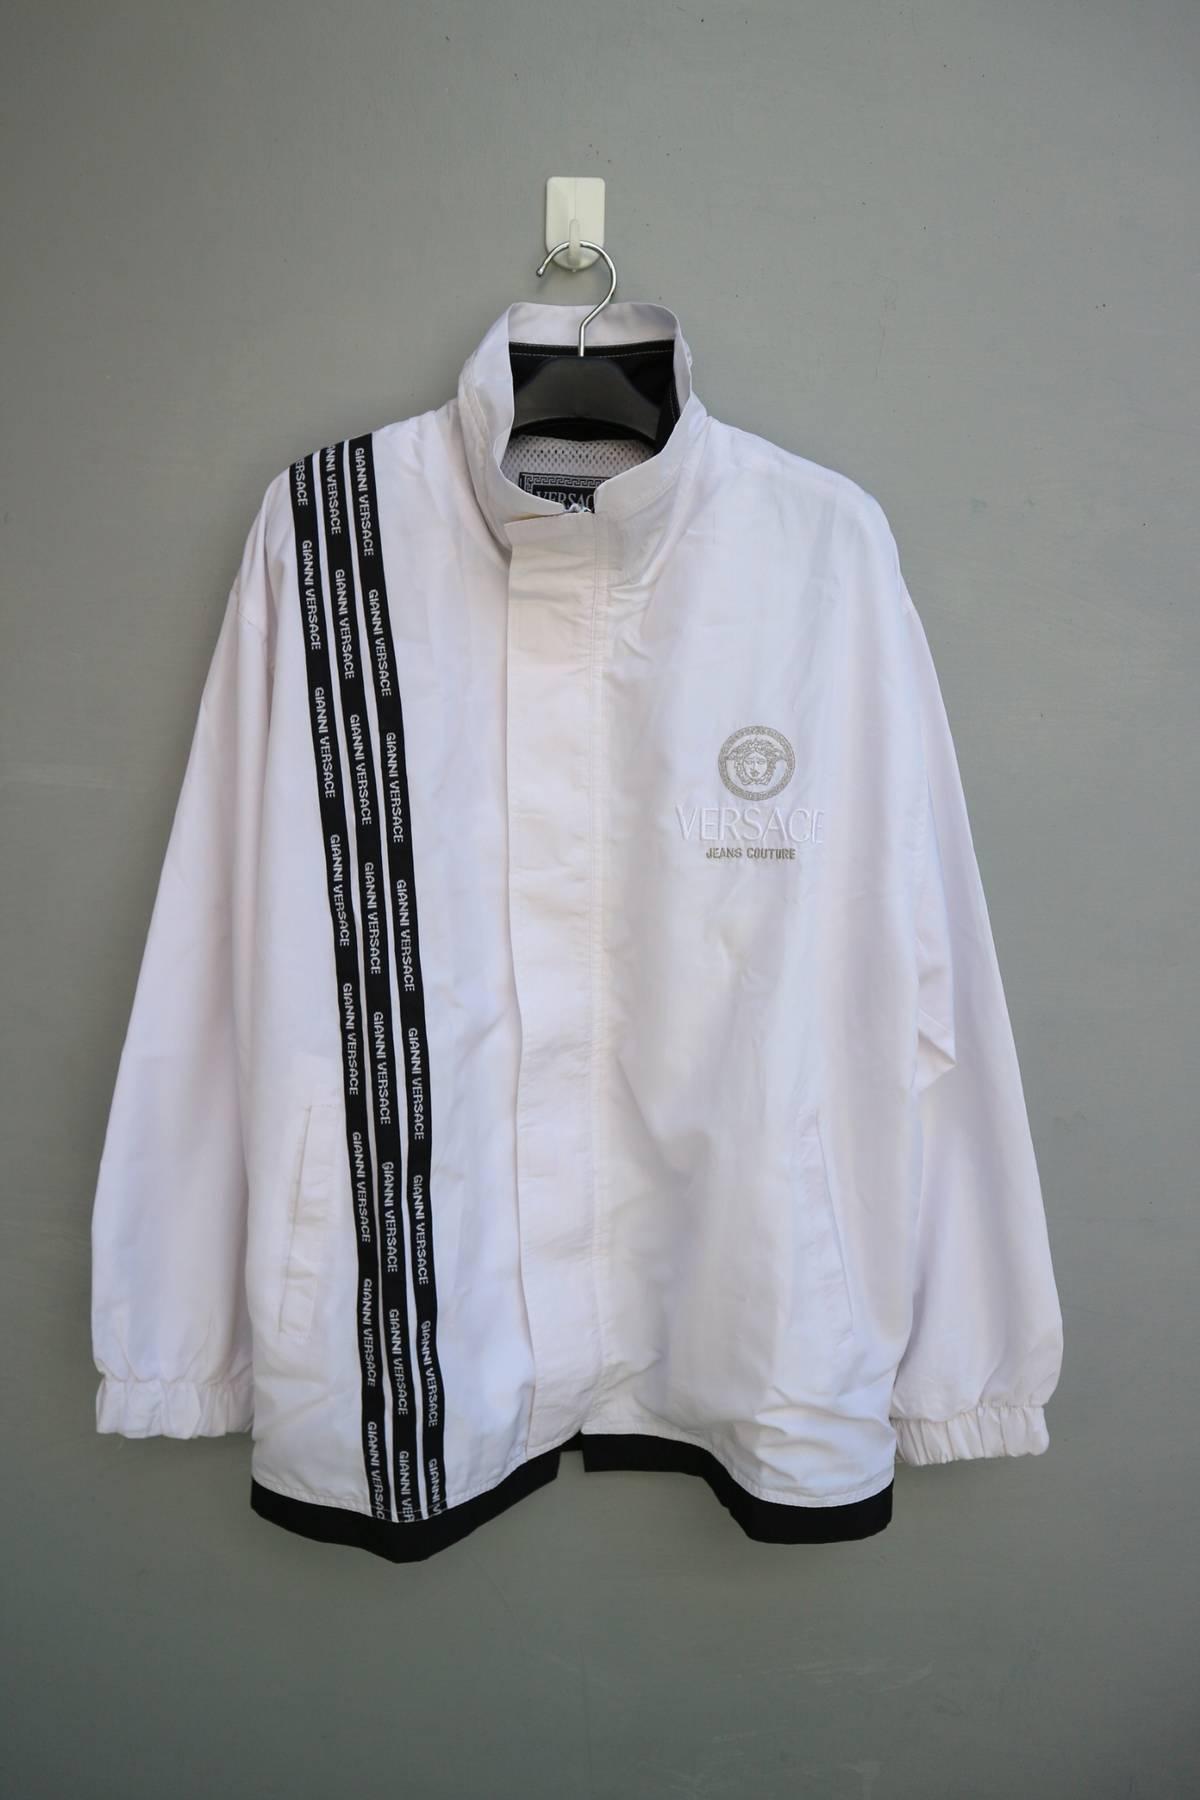 5f7a6278a43e Versace Jeans Couture. Versace jeans couture windbreaker jacket medusa head  embroidery. Size  US L   EU 52-54 ...